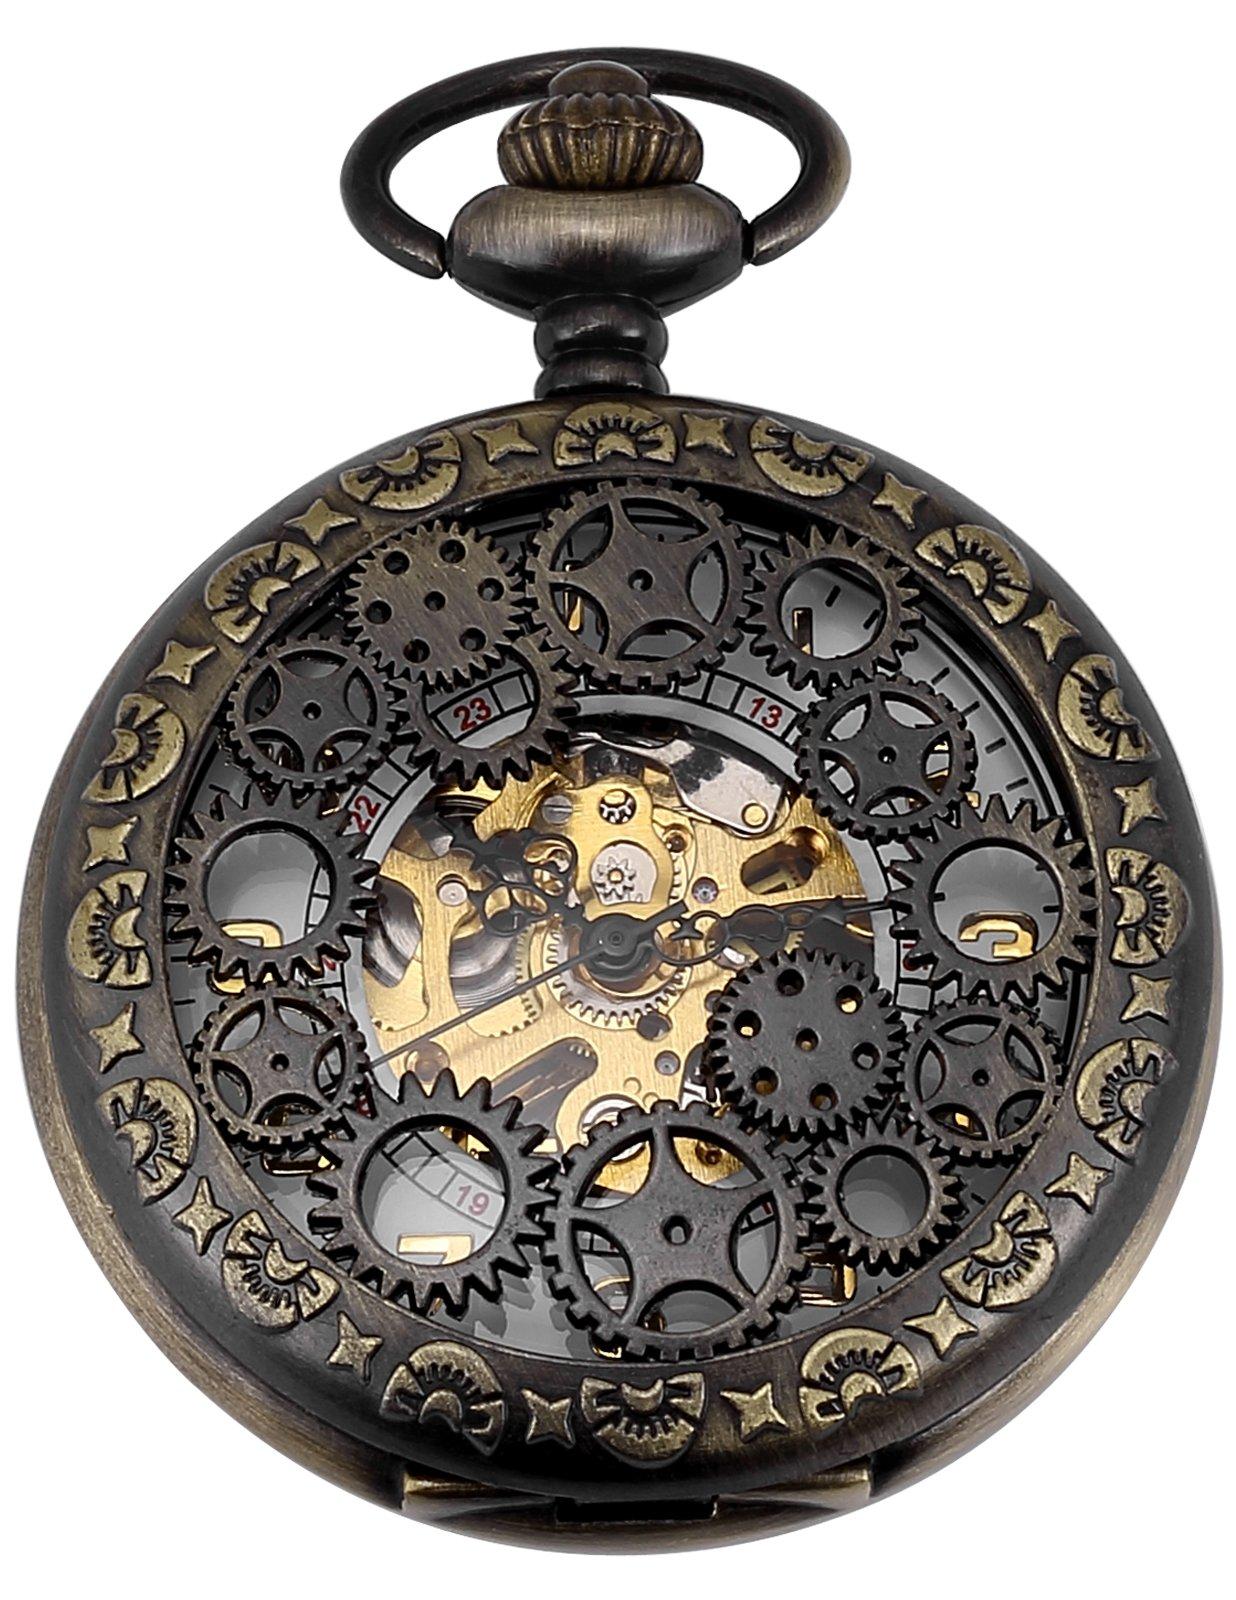 AMPM24 Mechanical Pocket Watch Skeleton Bronze Alloy Case WPK221